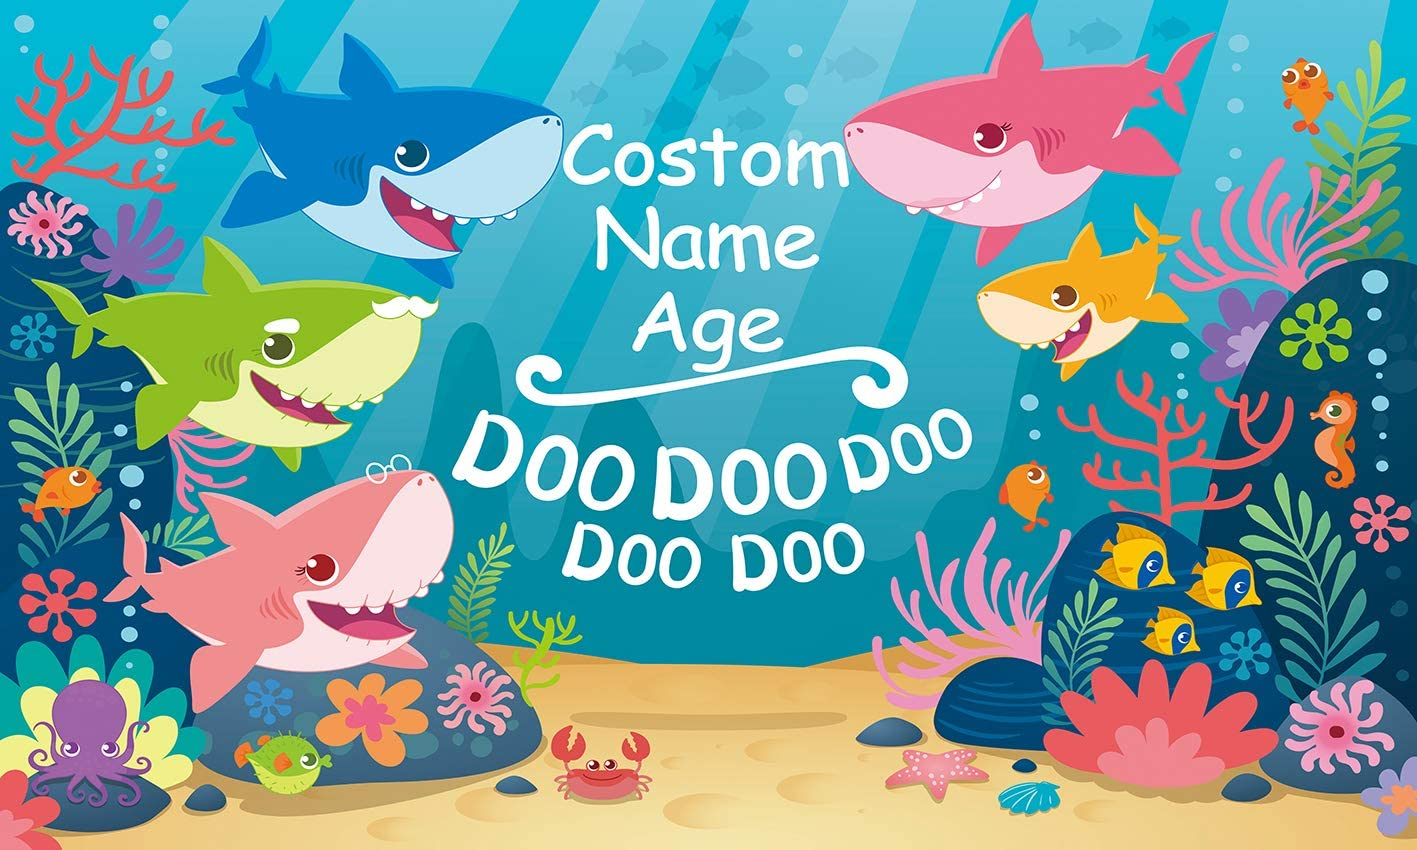 GYA Bady Shark Theme Backdrop Custom Name & Age Birthday Party Background 6x4ft